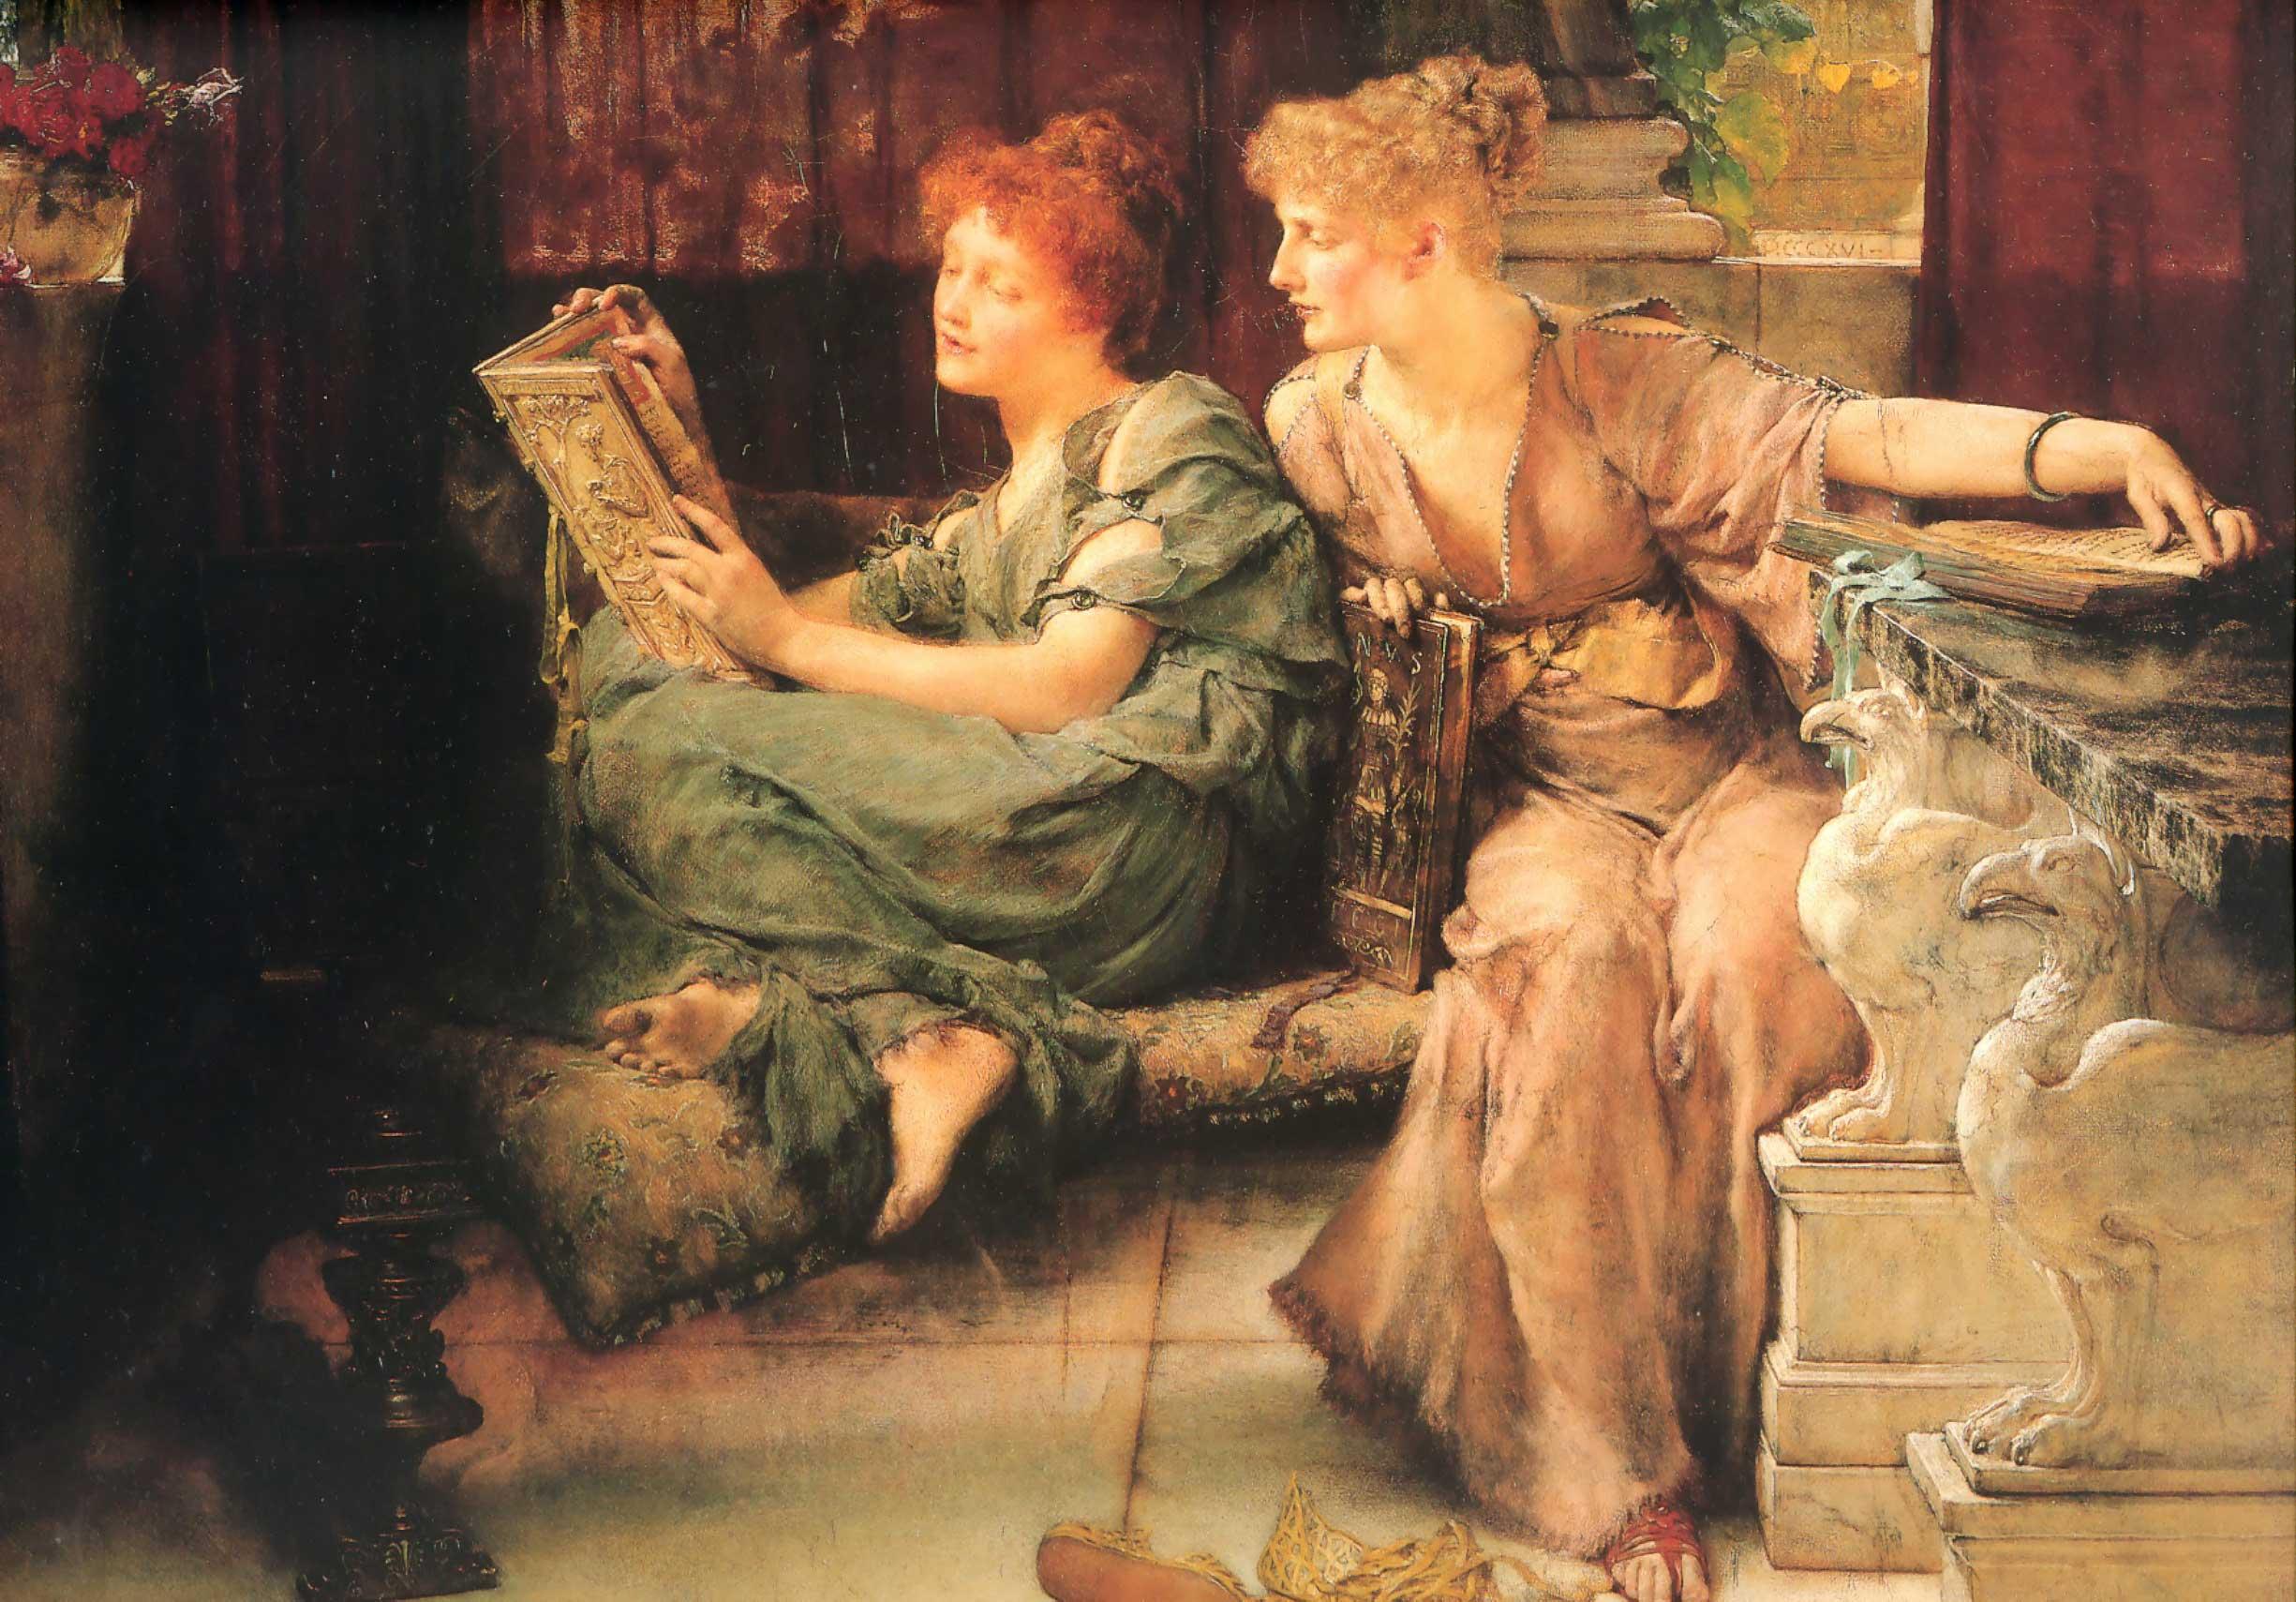 Sir Lawrence Alma-Tadema, Comparisons